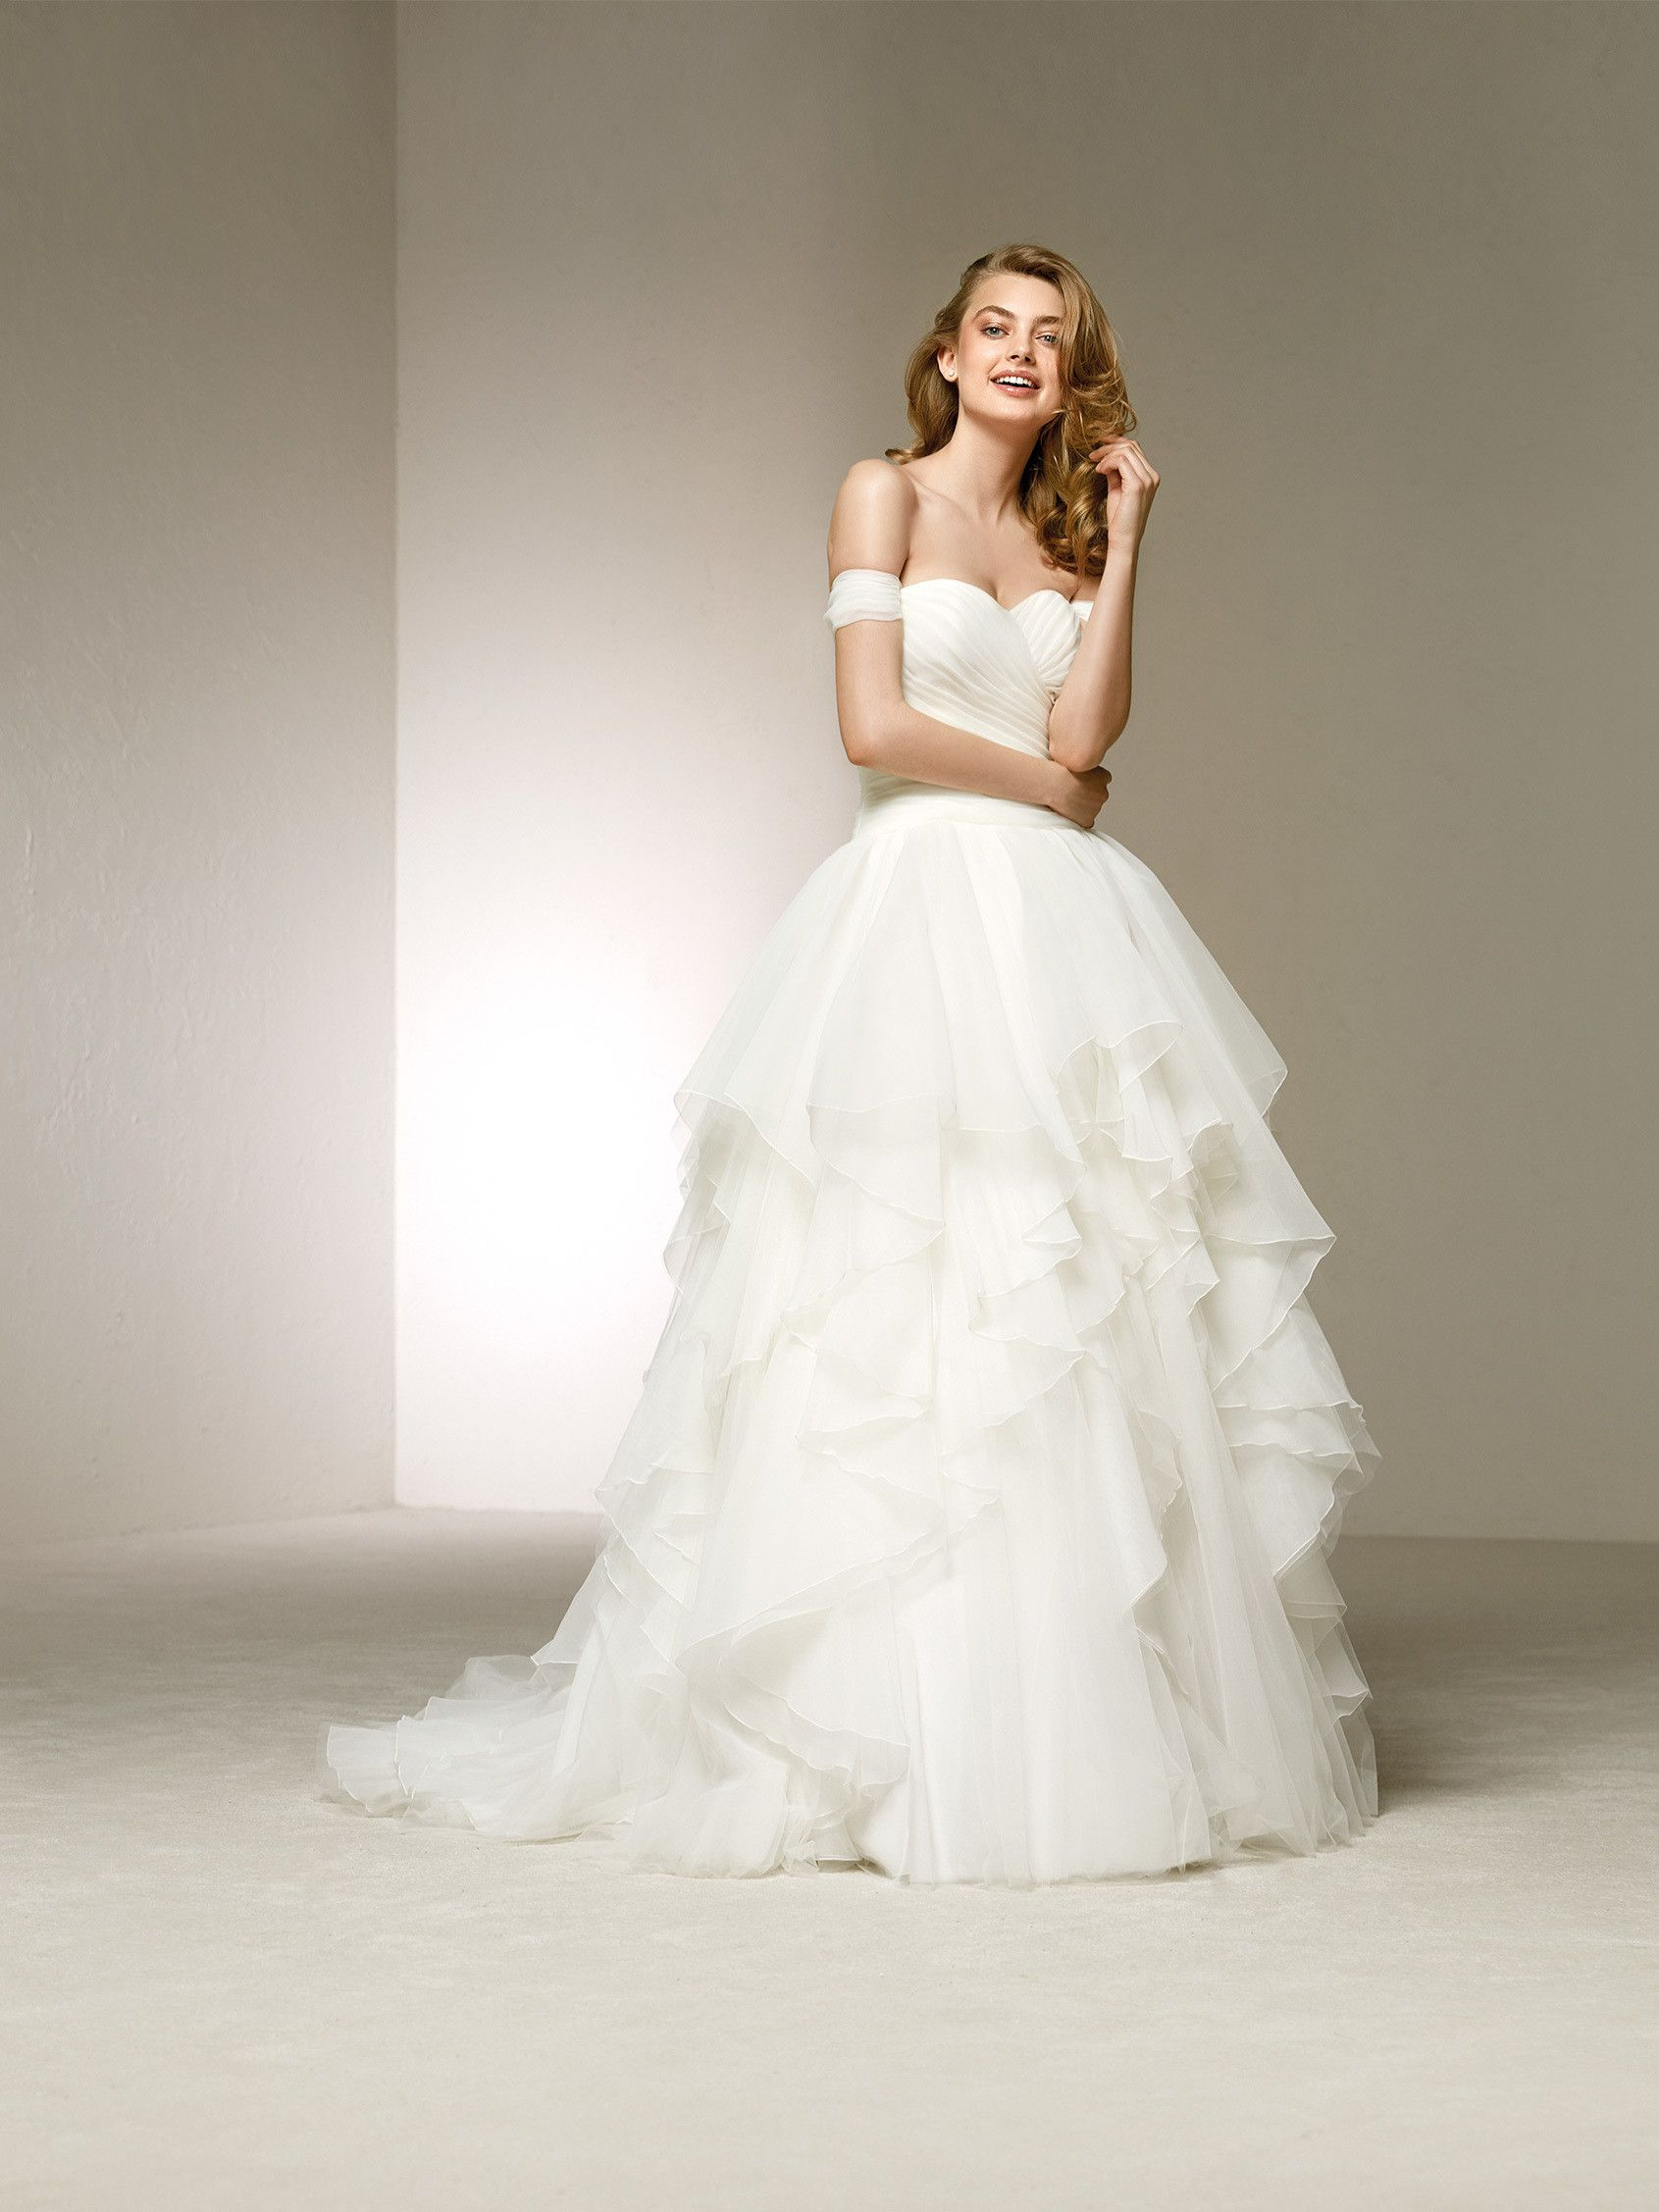 Cinderella inspired wedding dress  Pin by Hunter M on Dresses  Pinterest